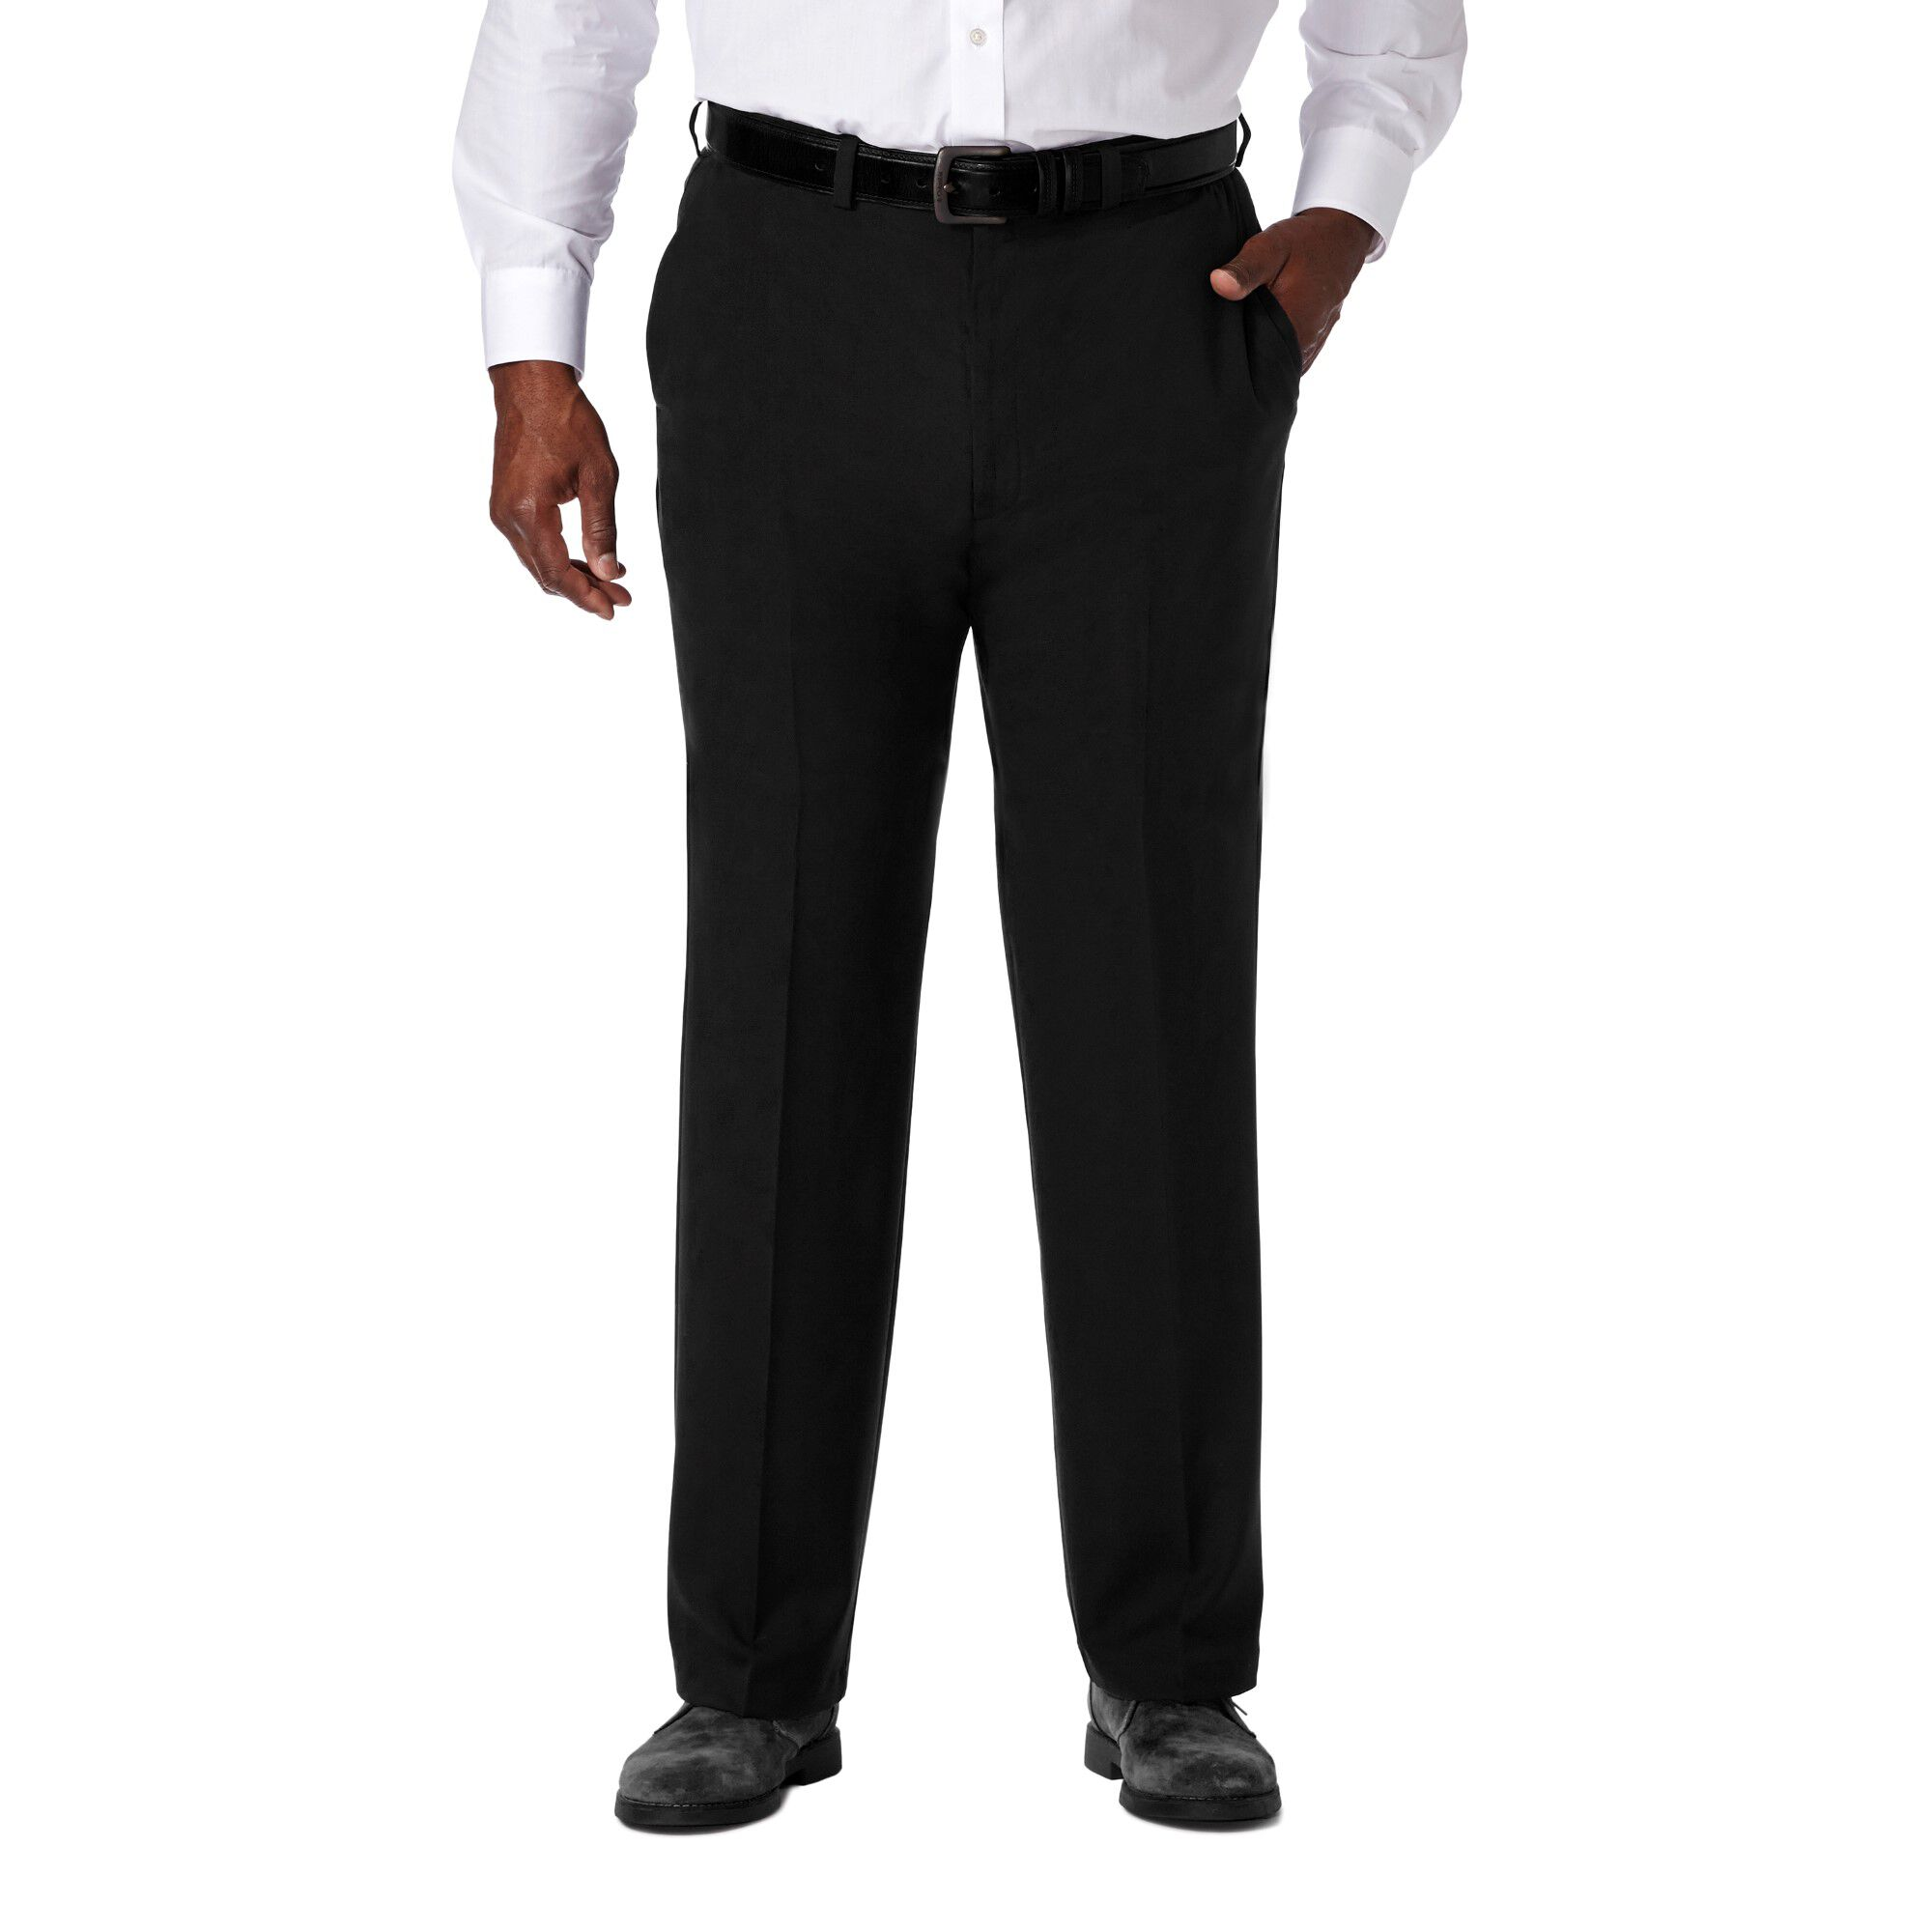 Haggar Mens Big and Tall Cool 18 Pro Classic Fit Flat Front Pant